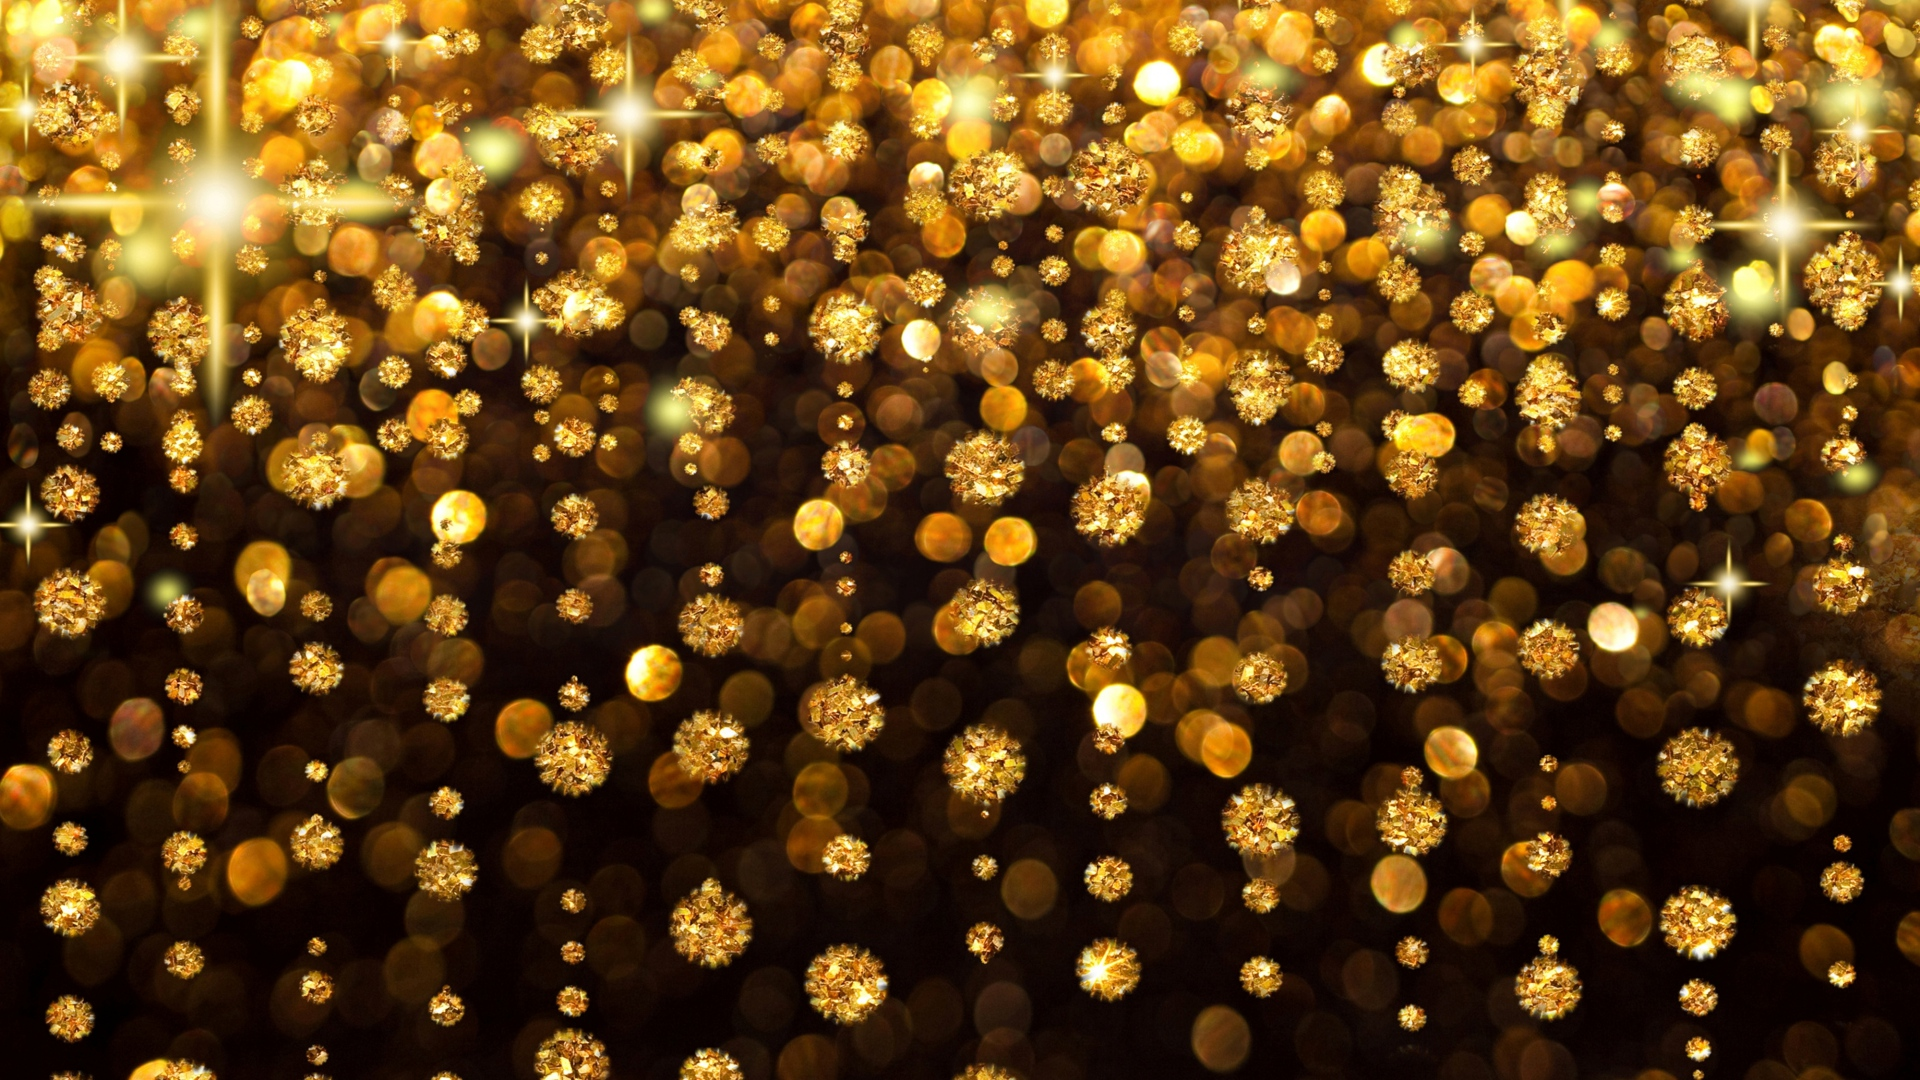 Full HD 1080p Gold Wallpapers HD, Desktop Backgrounds 1920x1080